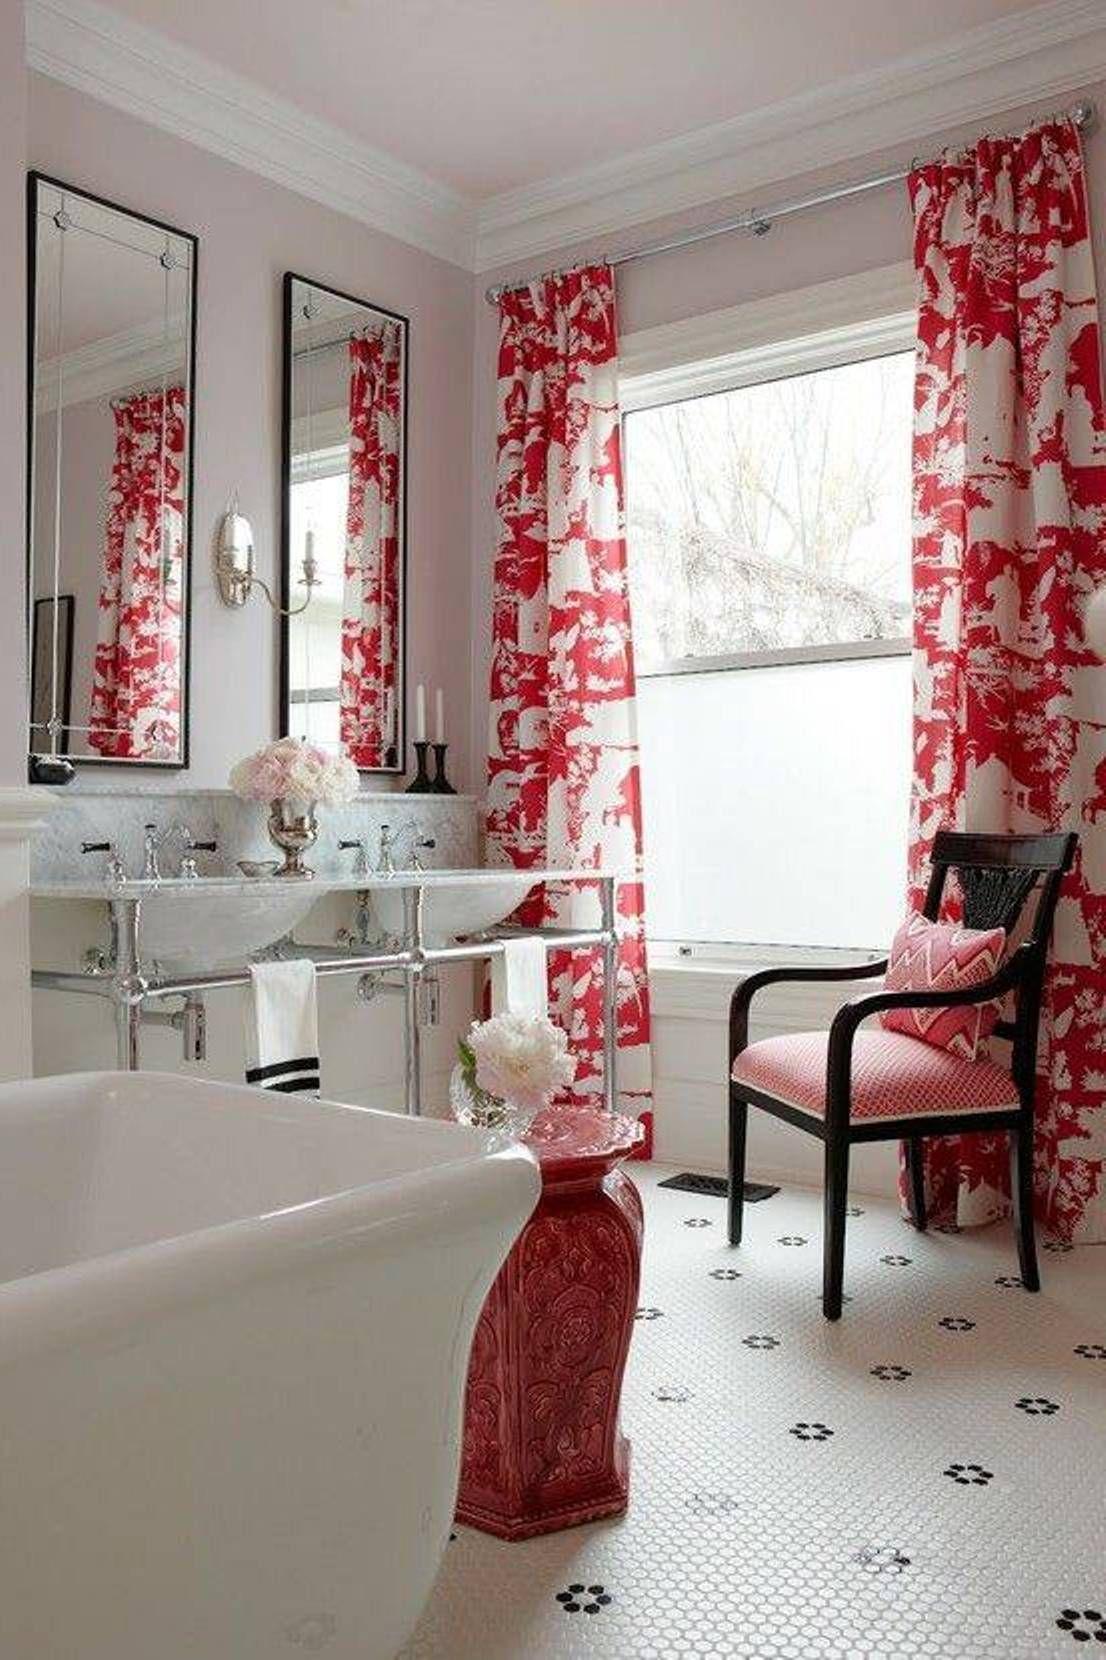 Window Curtains For Bathroom  Bathroom Window Curtains Bathroom Amazing Small Bathroom Window Curtain 2018